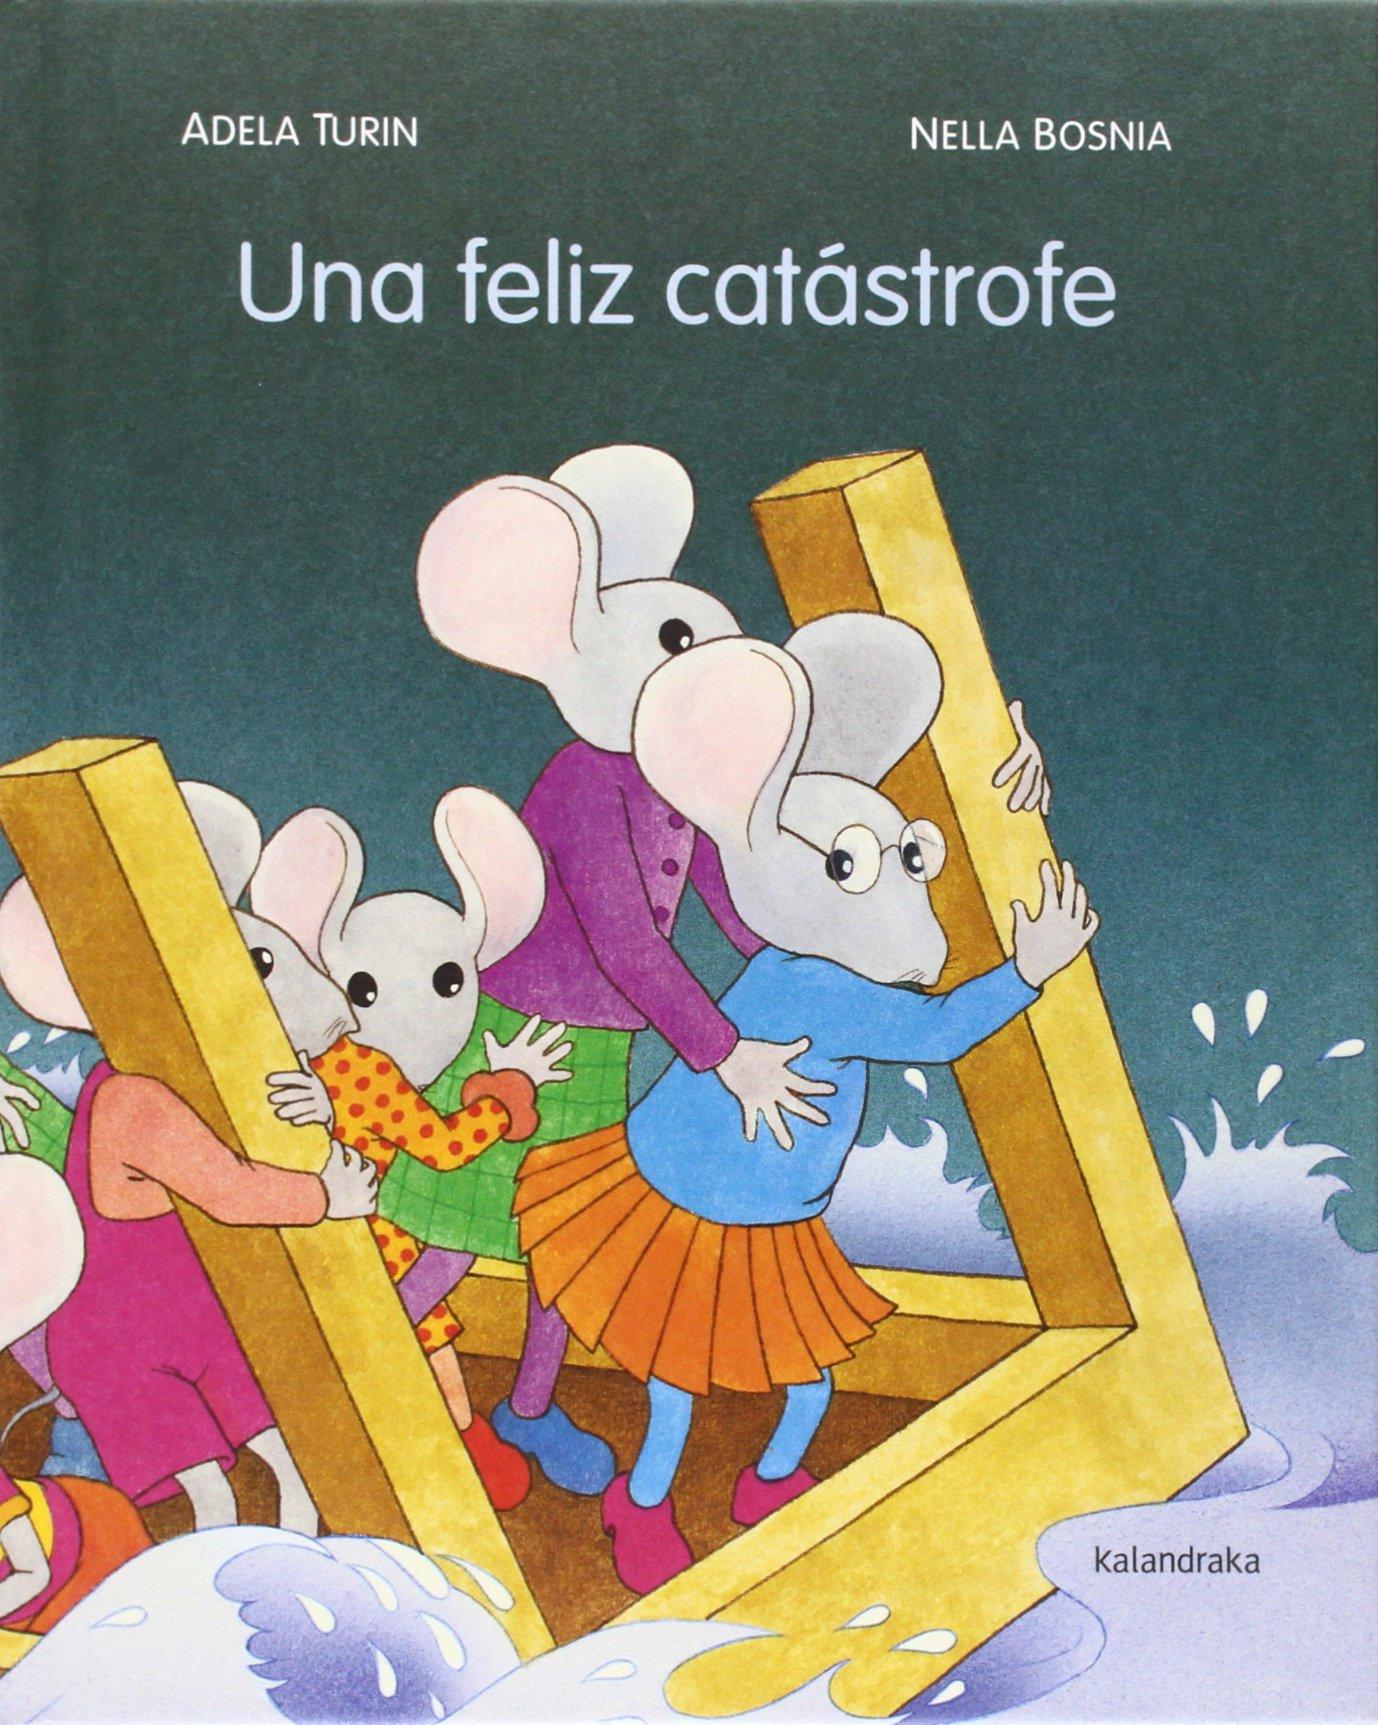 Una feliz catástrofe (libros para soñar): Amazon.es: Adela Turin, Nella  Bosnia, Xosé Ballesteros: Libros